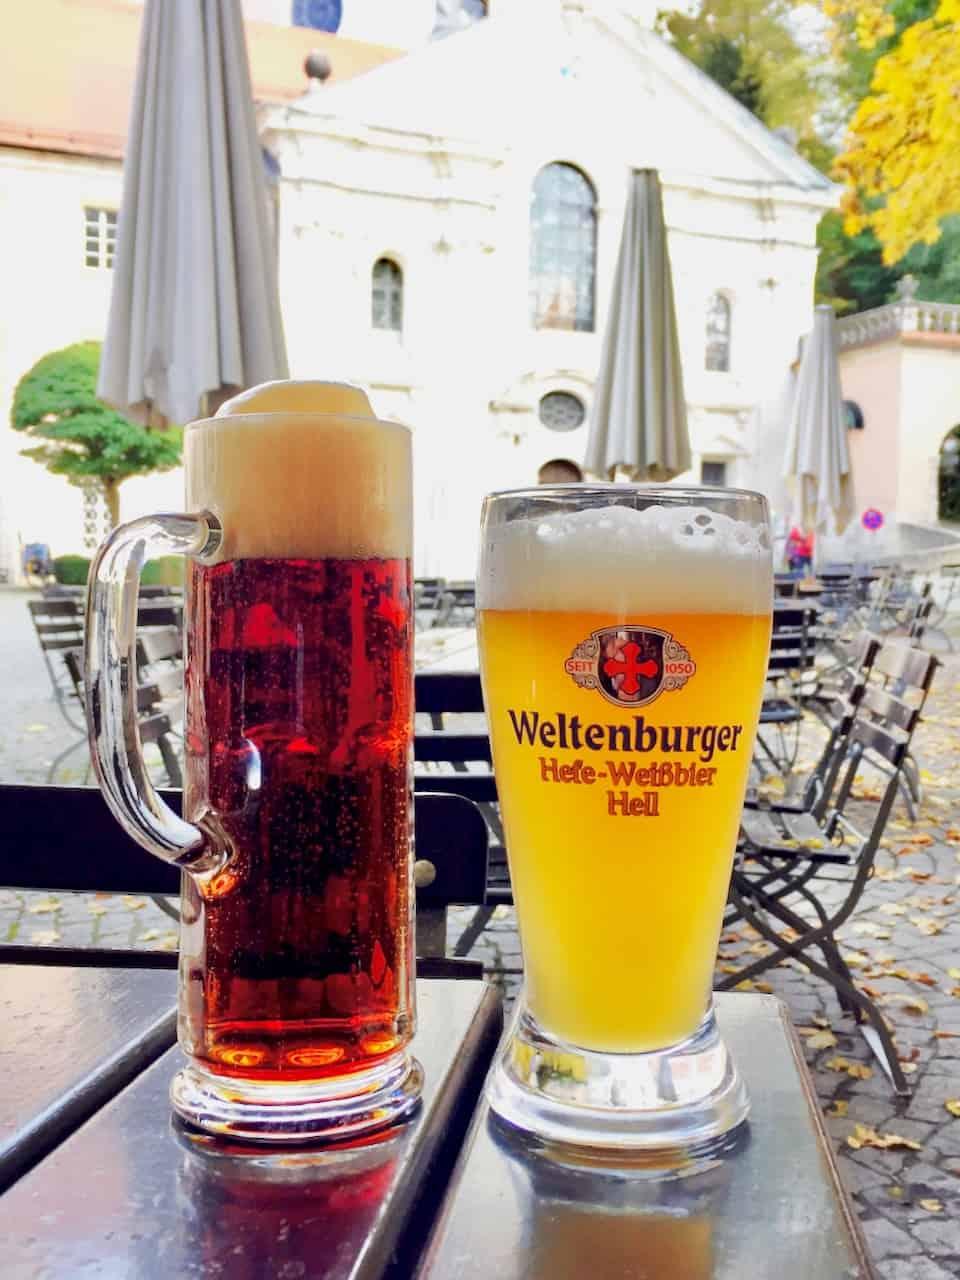 weltenburg-beer-dunkel-hefeweiss-photo